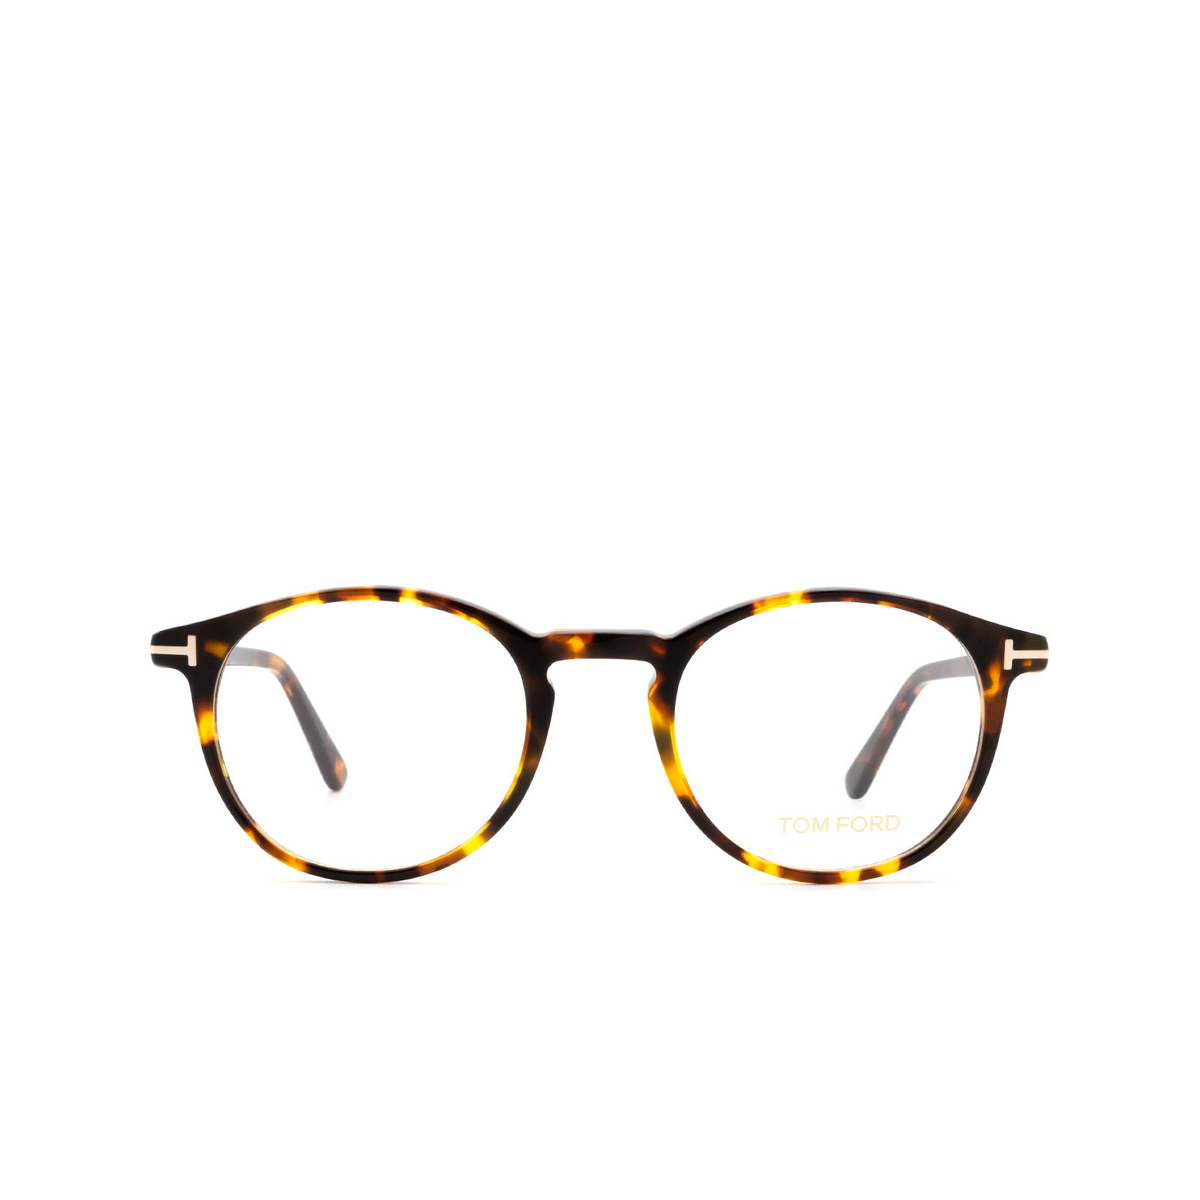 Tom Ford® Round Eyeglasses: FT5294 color Dark Havana 52A.